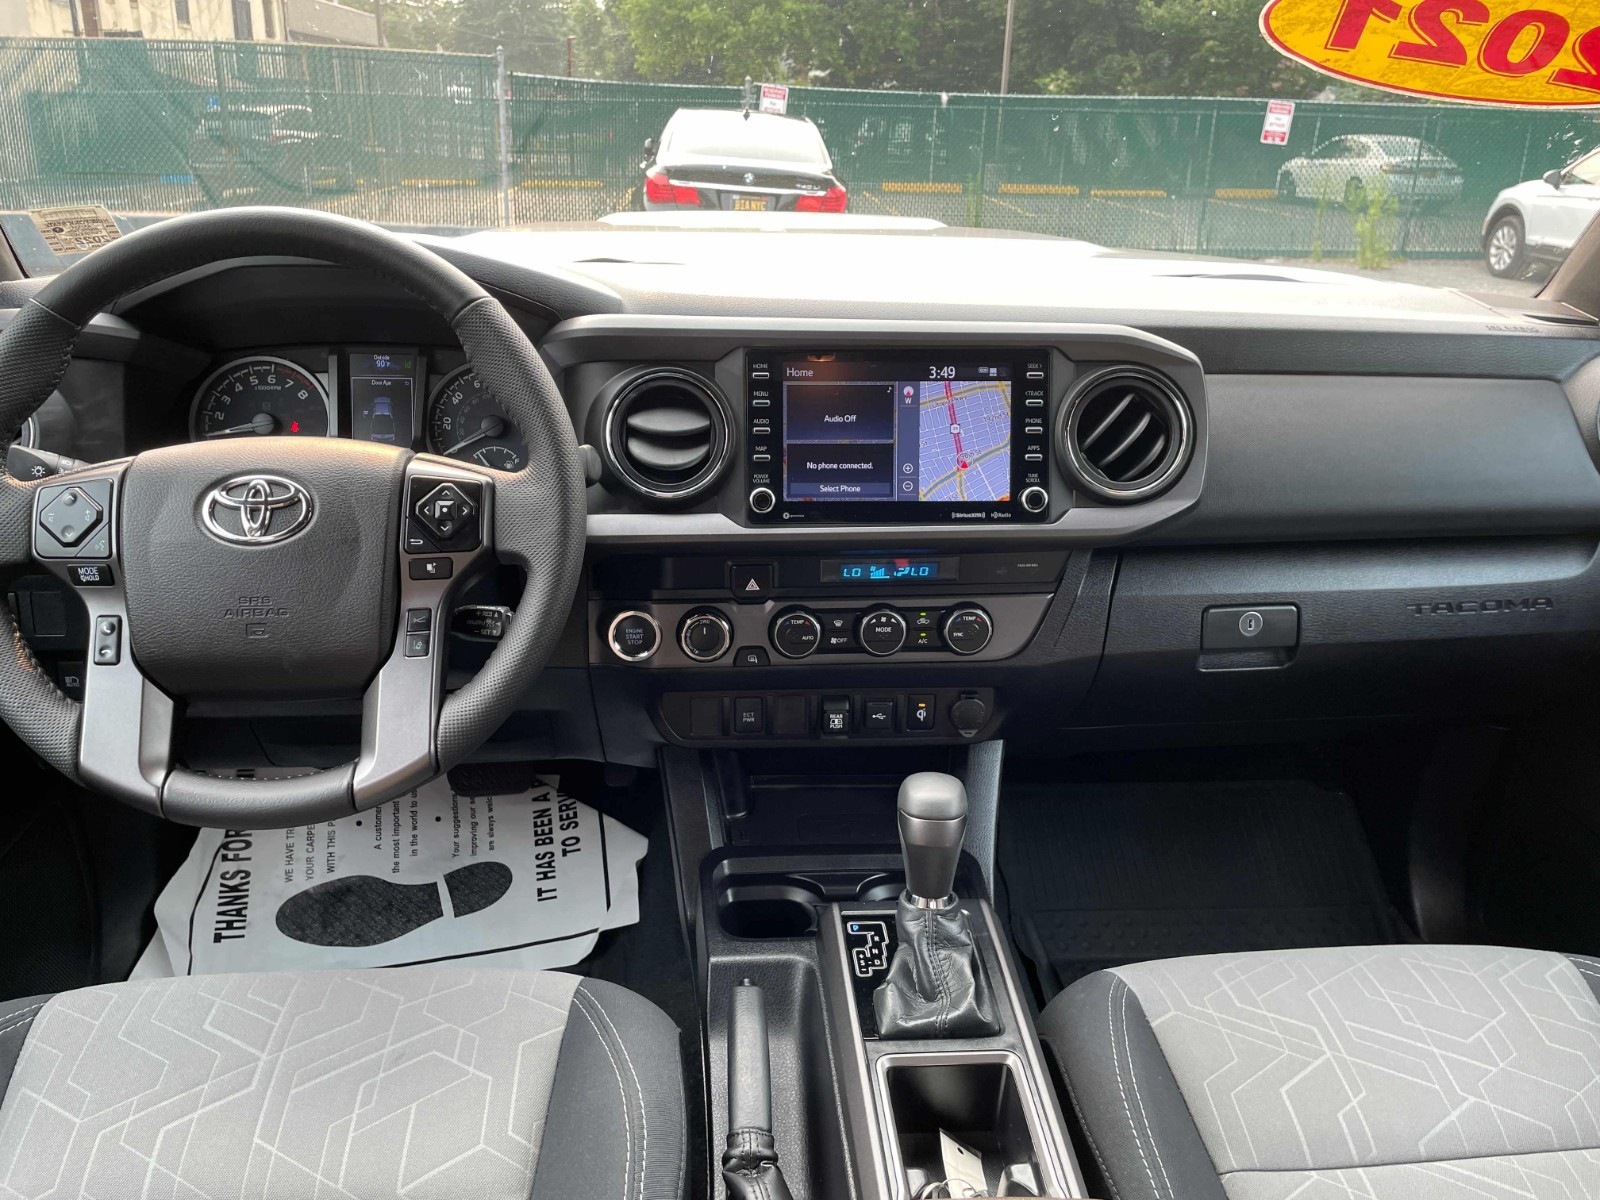 2021 Toyota Tacoma SR5 TRD SPORT 只开了8300 miles 超级 保值的一款皮卡车 而且还是double cab